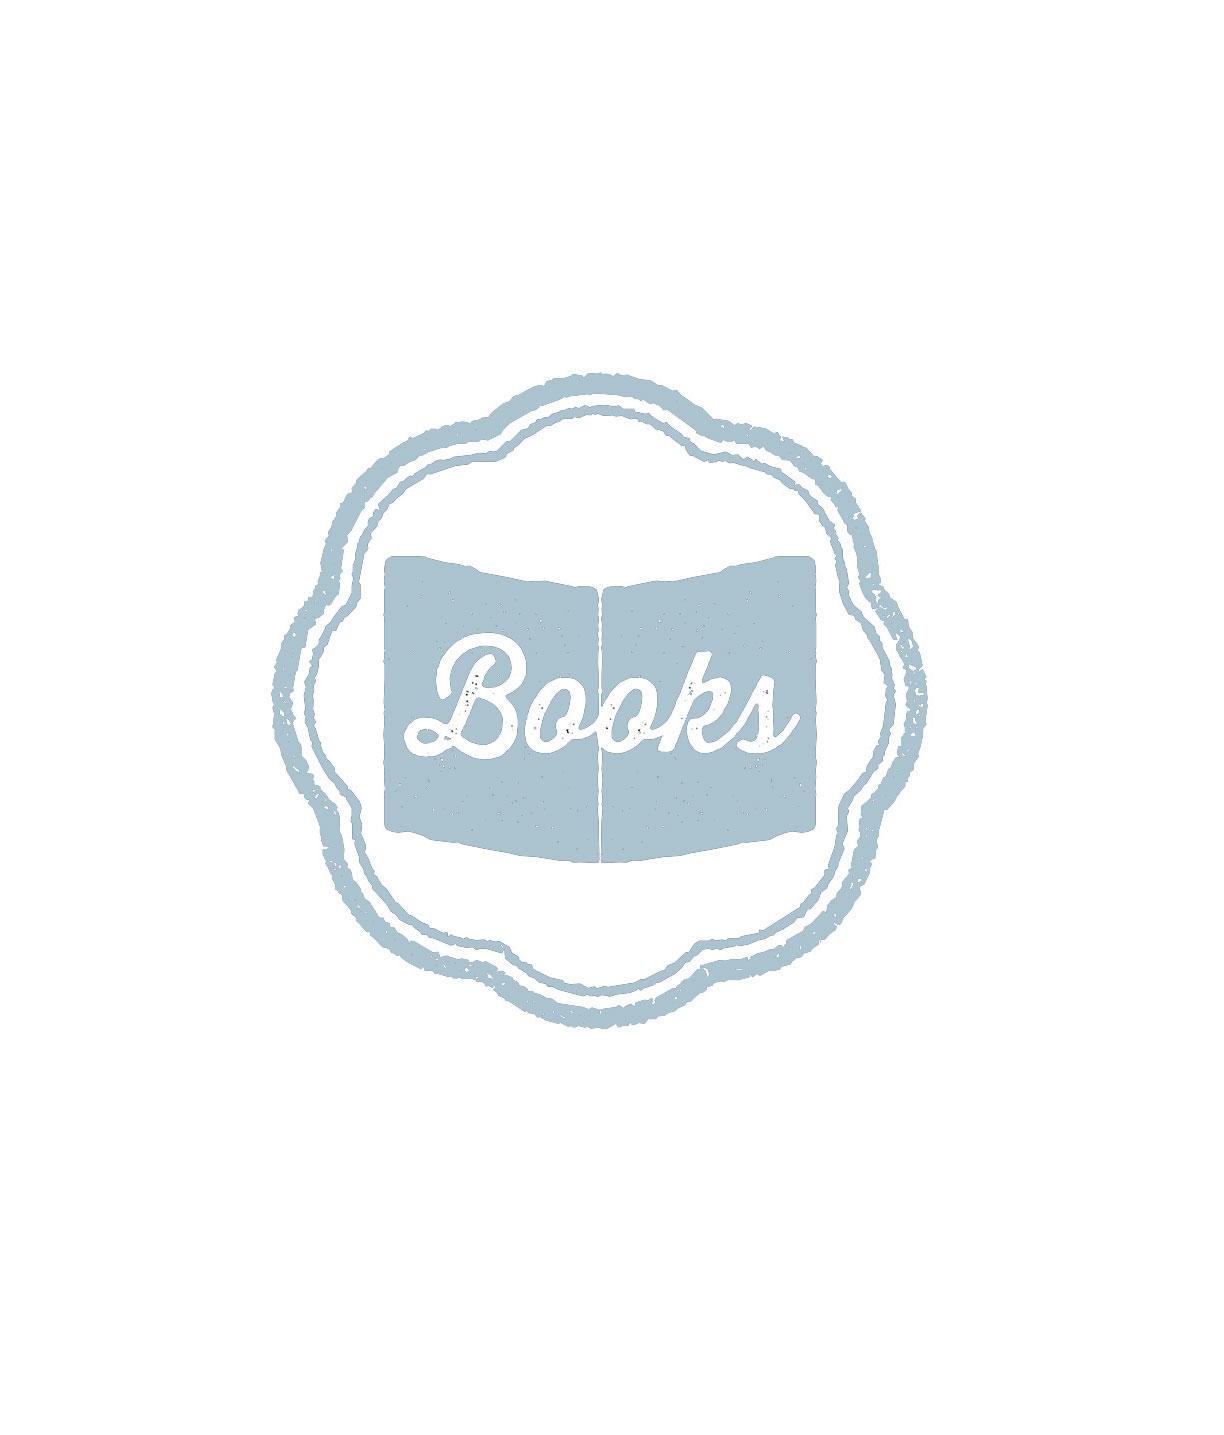 books-type-treatment-gray-blue-OP.jpg